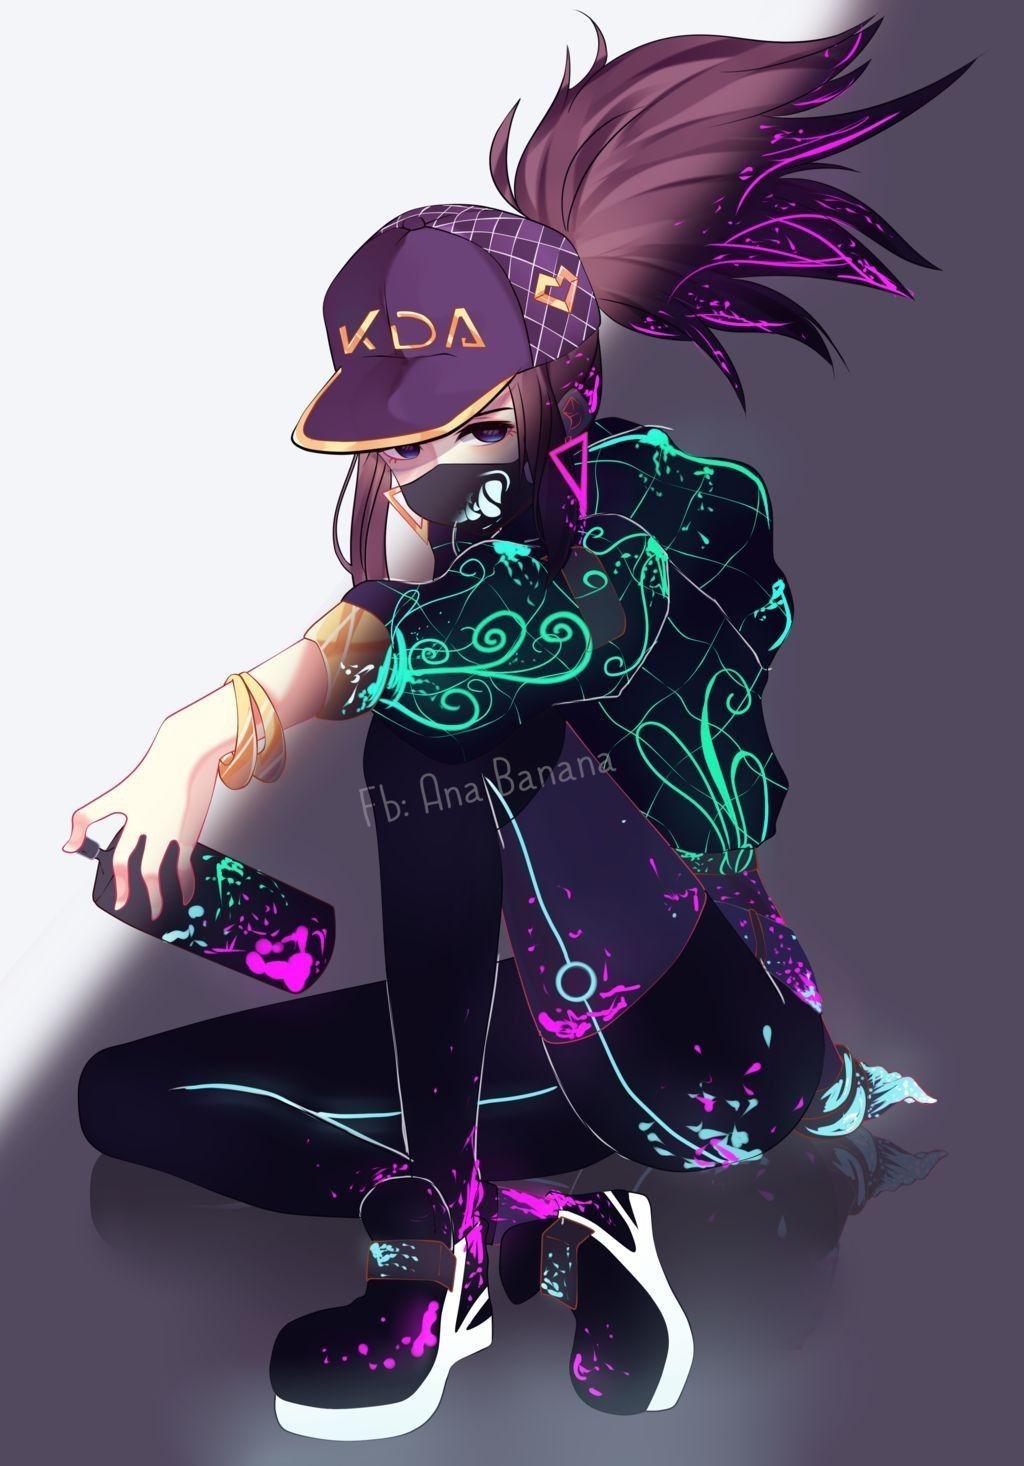 Goblok Anime Neko Ilustrasi Komik Studio Animasi